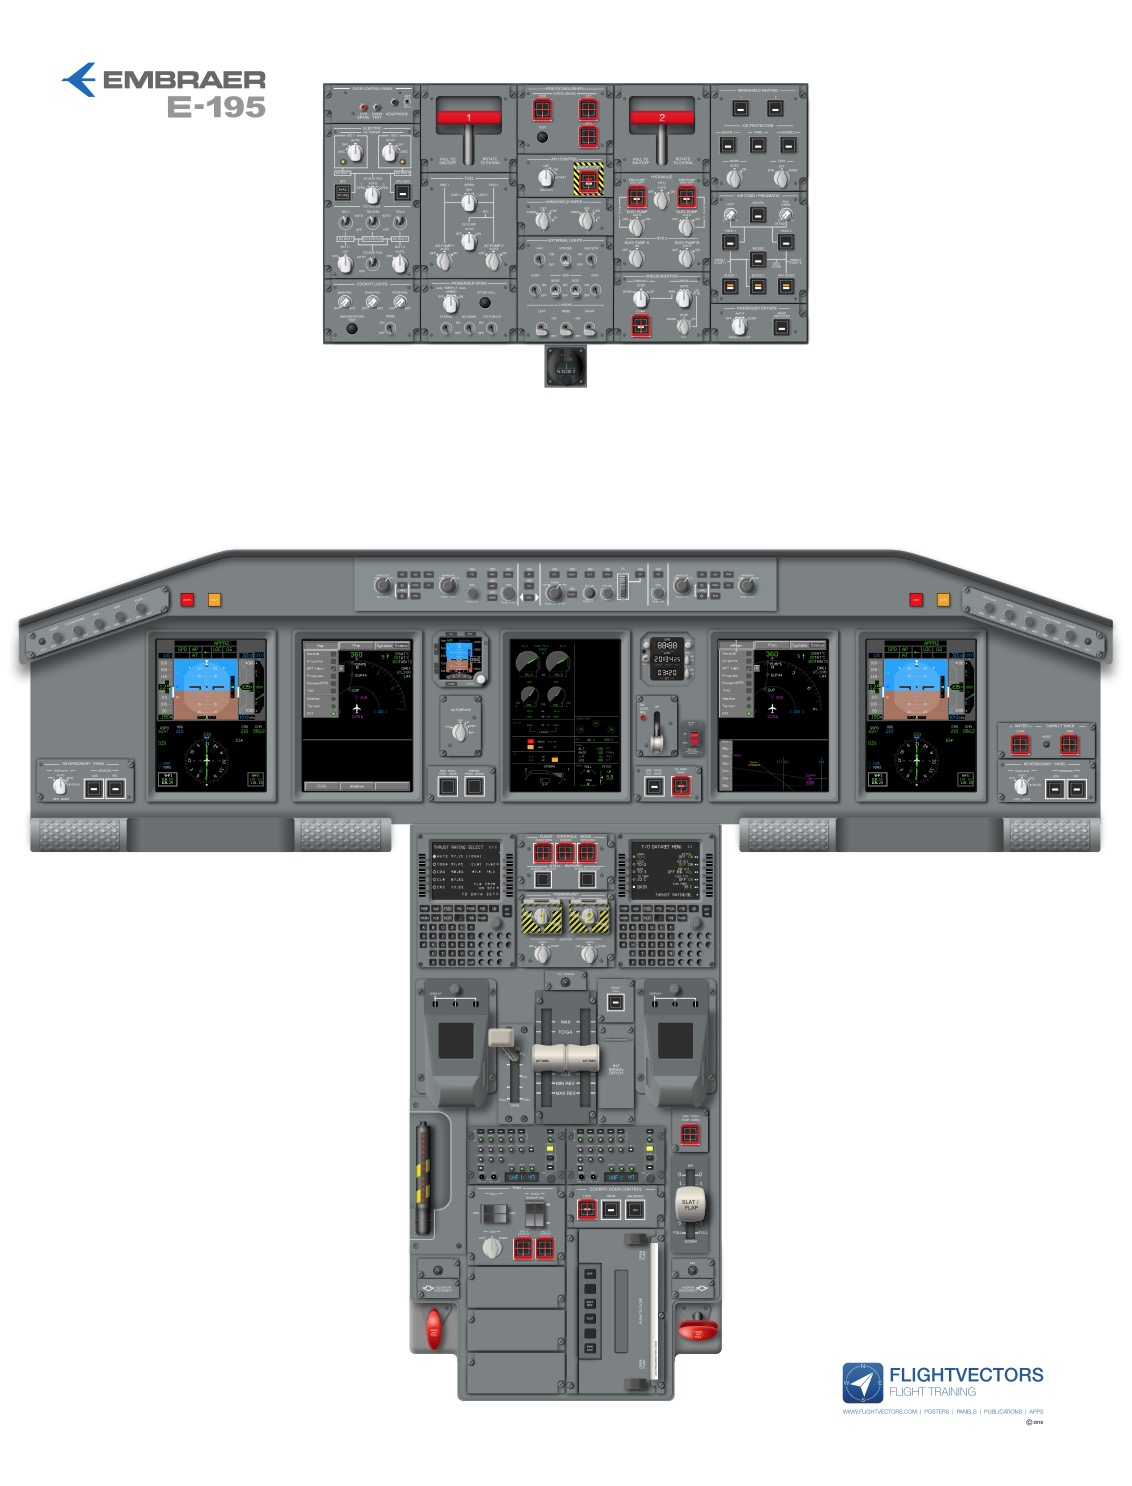 E170-195